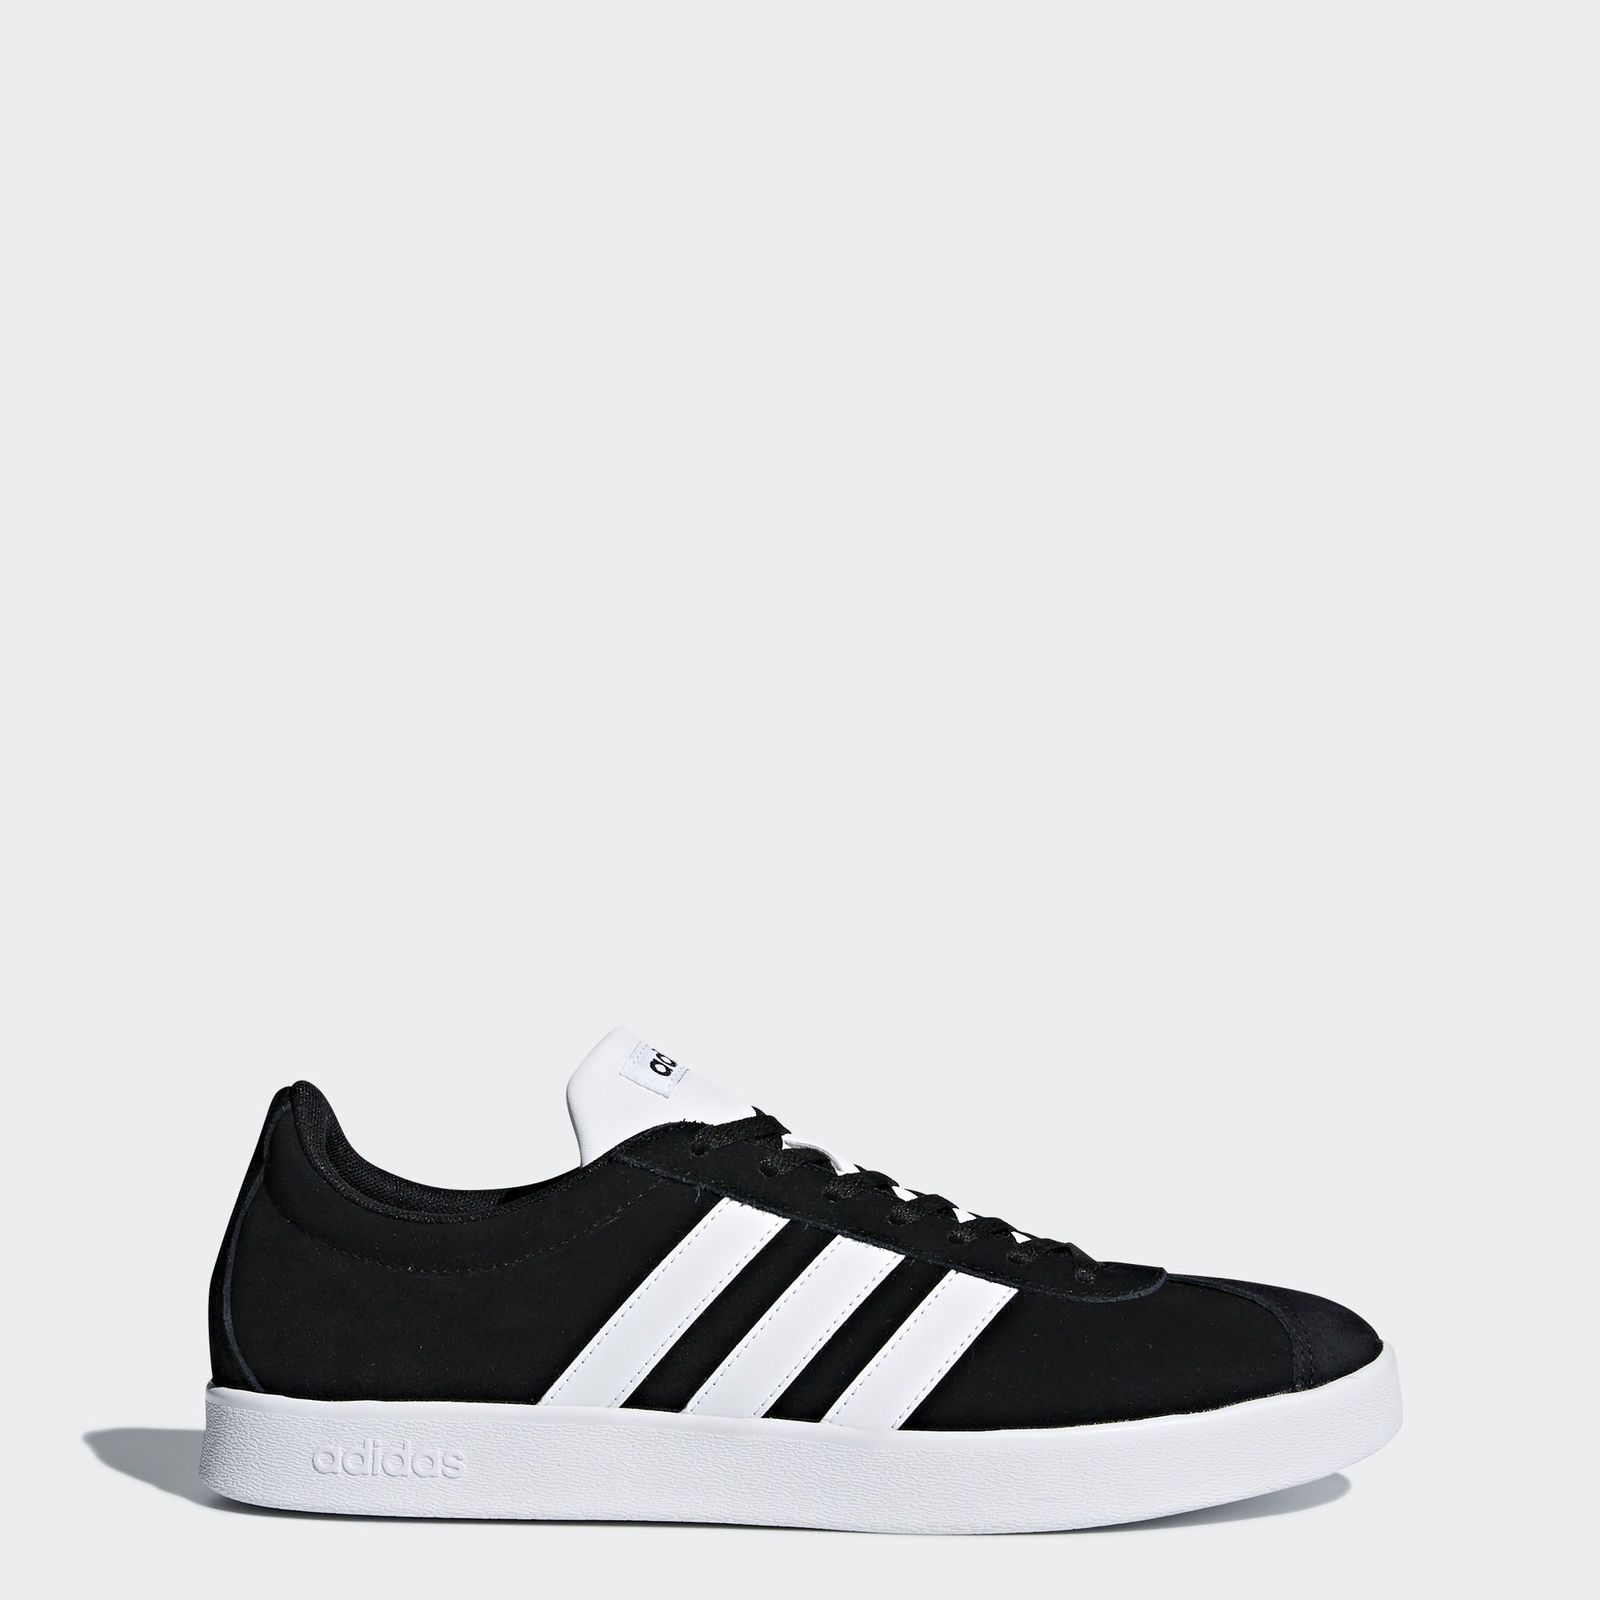 adidas VL Court 2.0 Shoes Mens